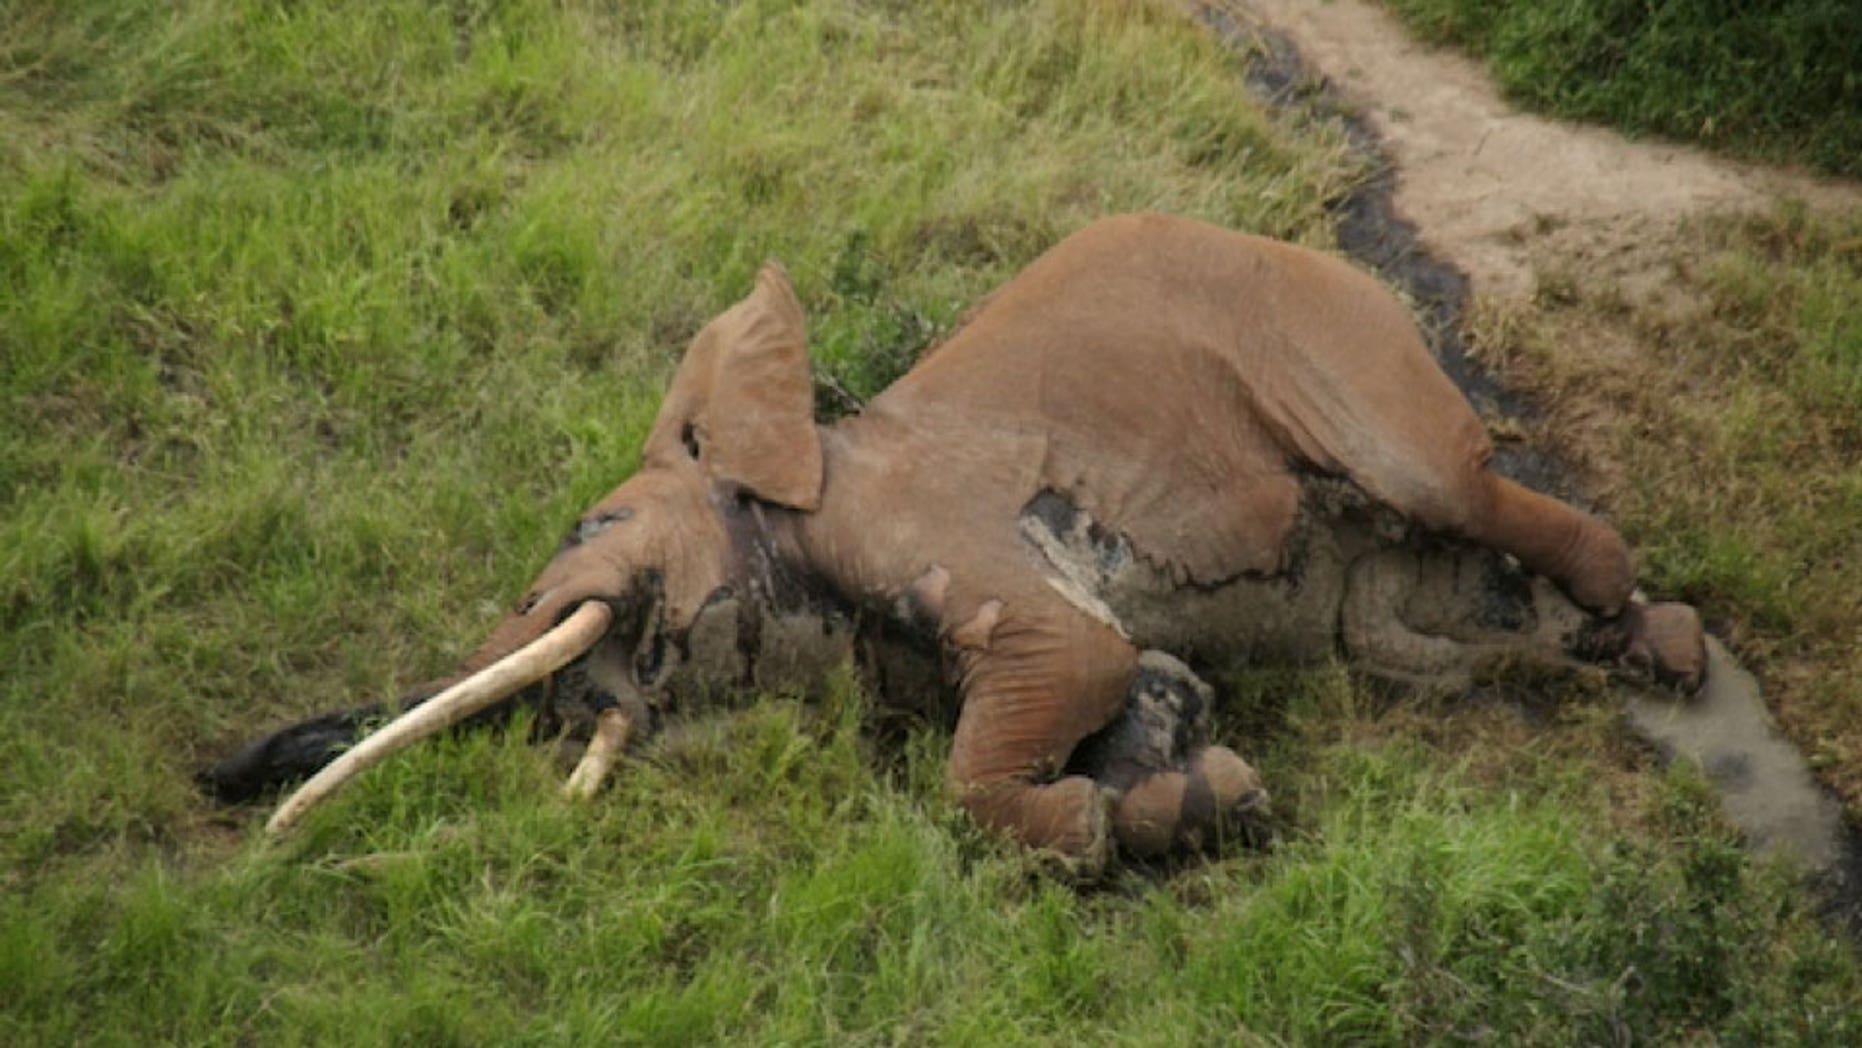 Satao II, a 'giant tusker' elephant was killed by poachers in Kenya, leaving 25 left in the wild.